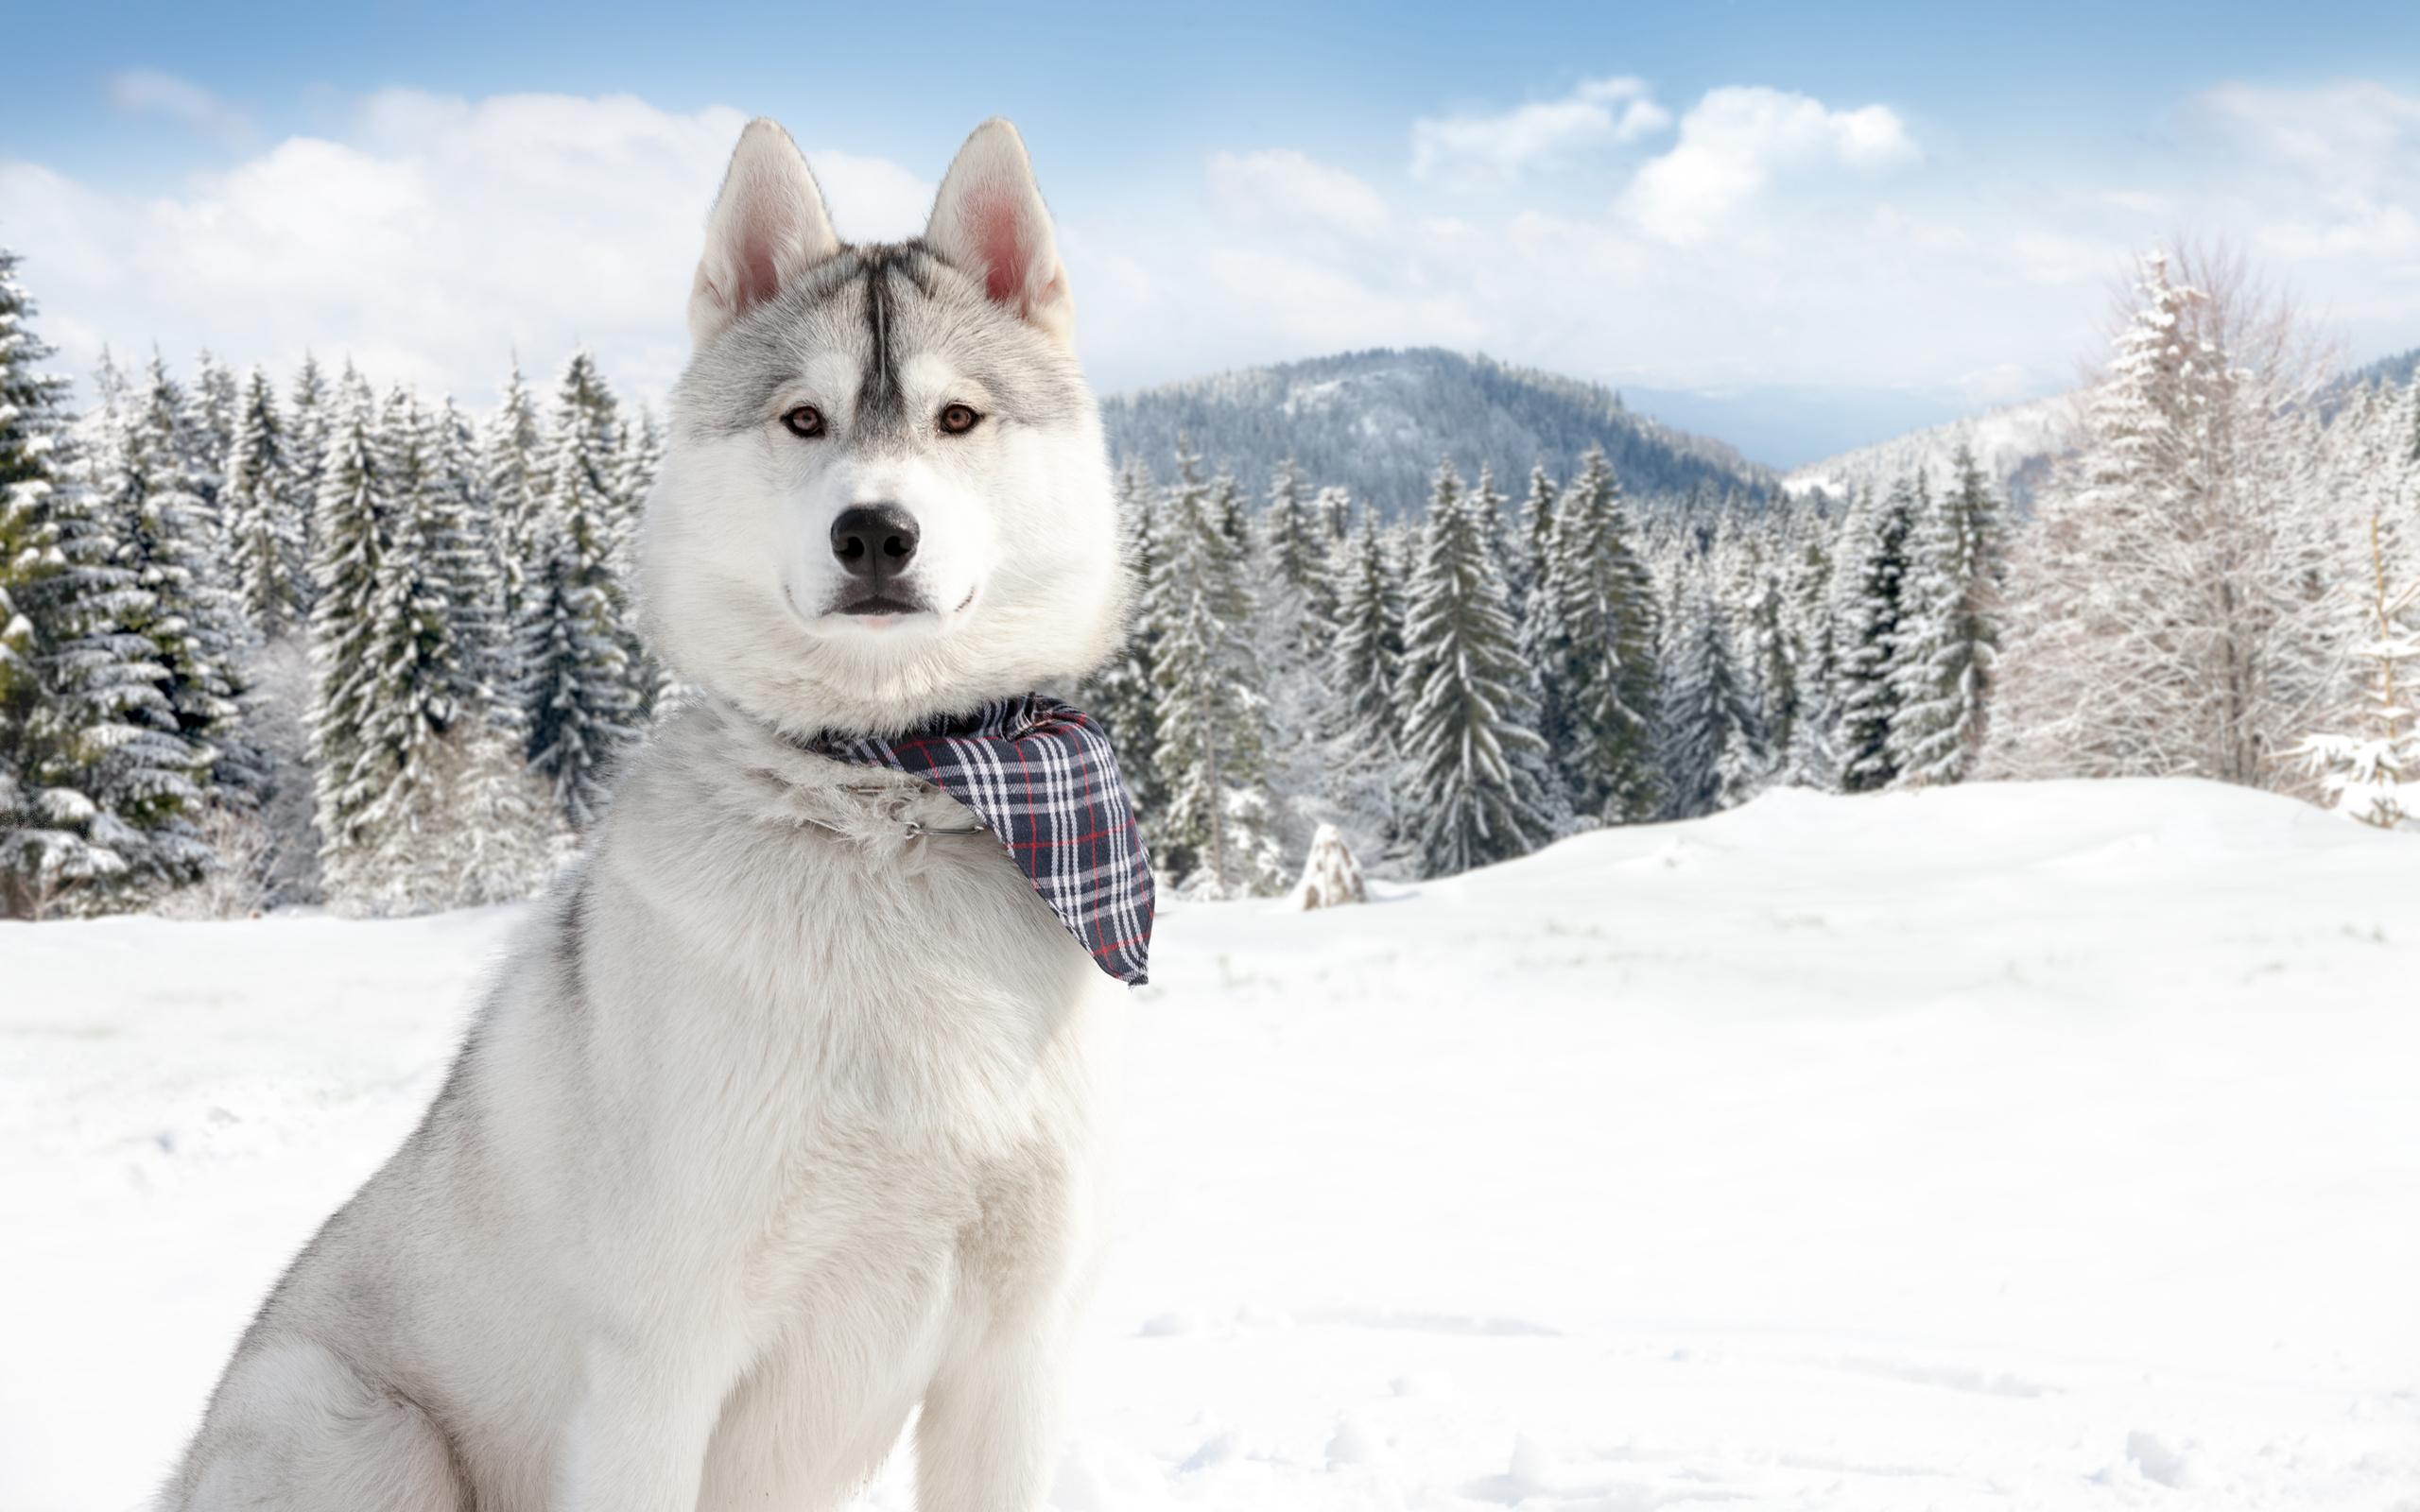 Nature winter snow dogs wallpaper 2560x1600 176635 WallpaperUP 2560x1600